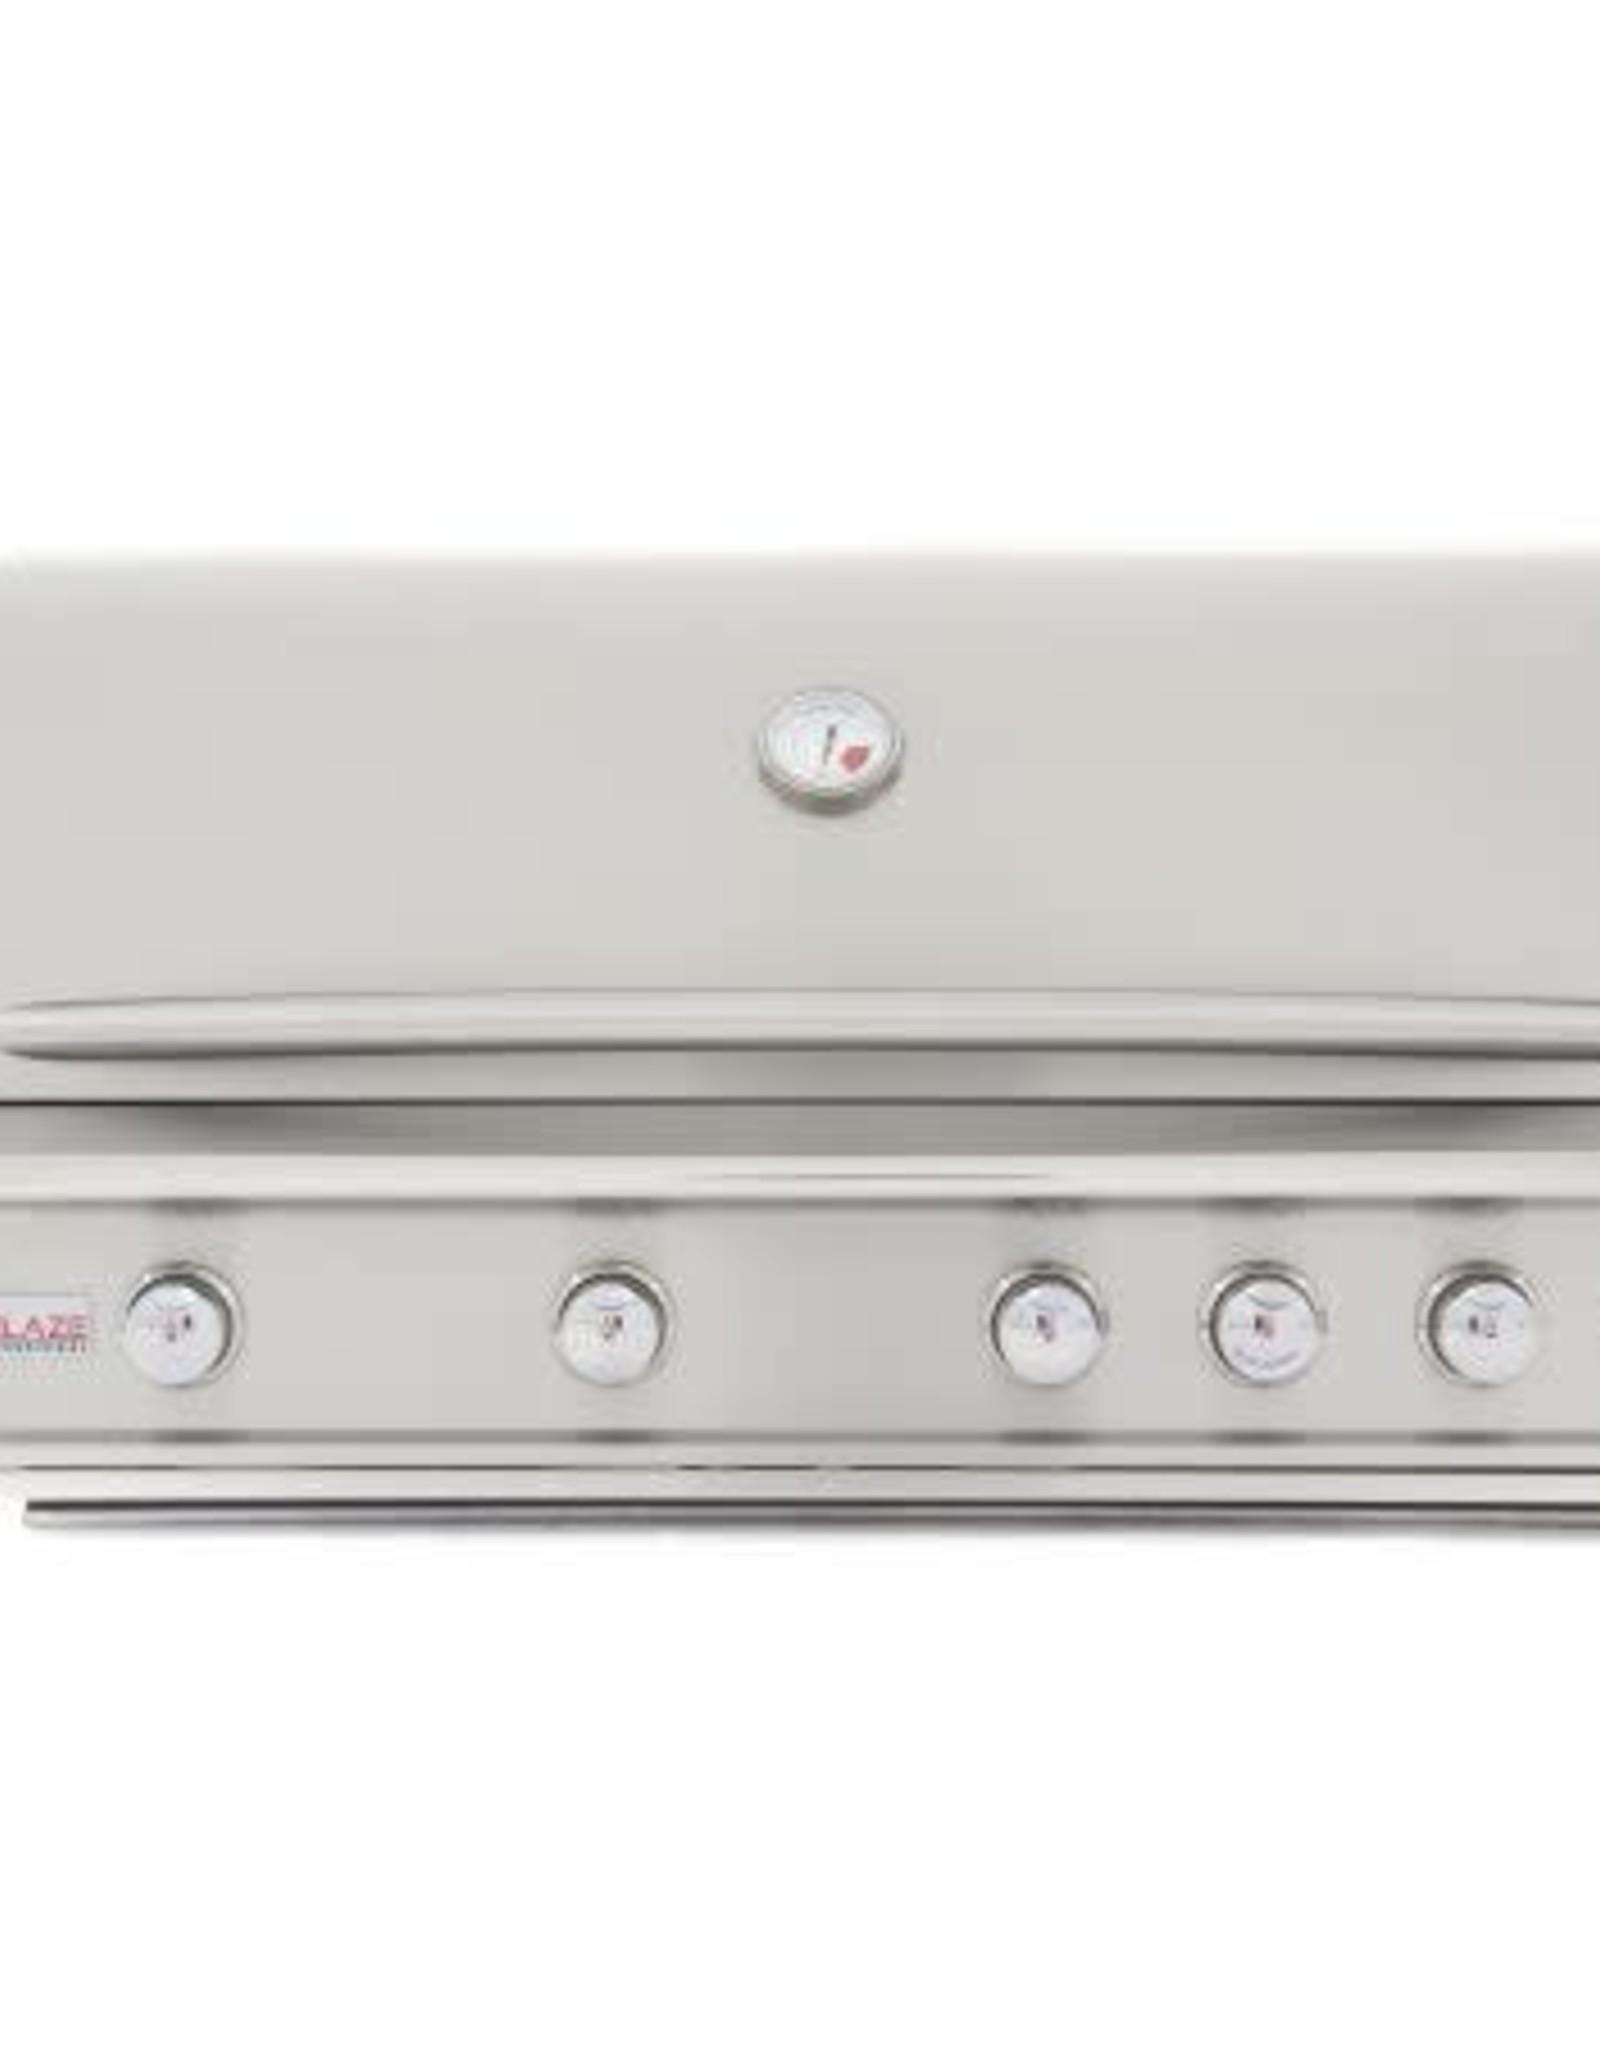 Blaze Outdoor Products Blaze 4 Burner Blaze Pro Grill - BLZ-4PRO-LP